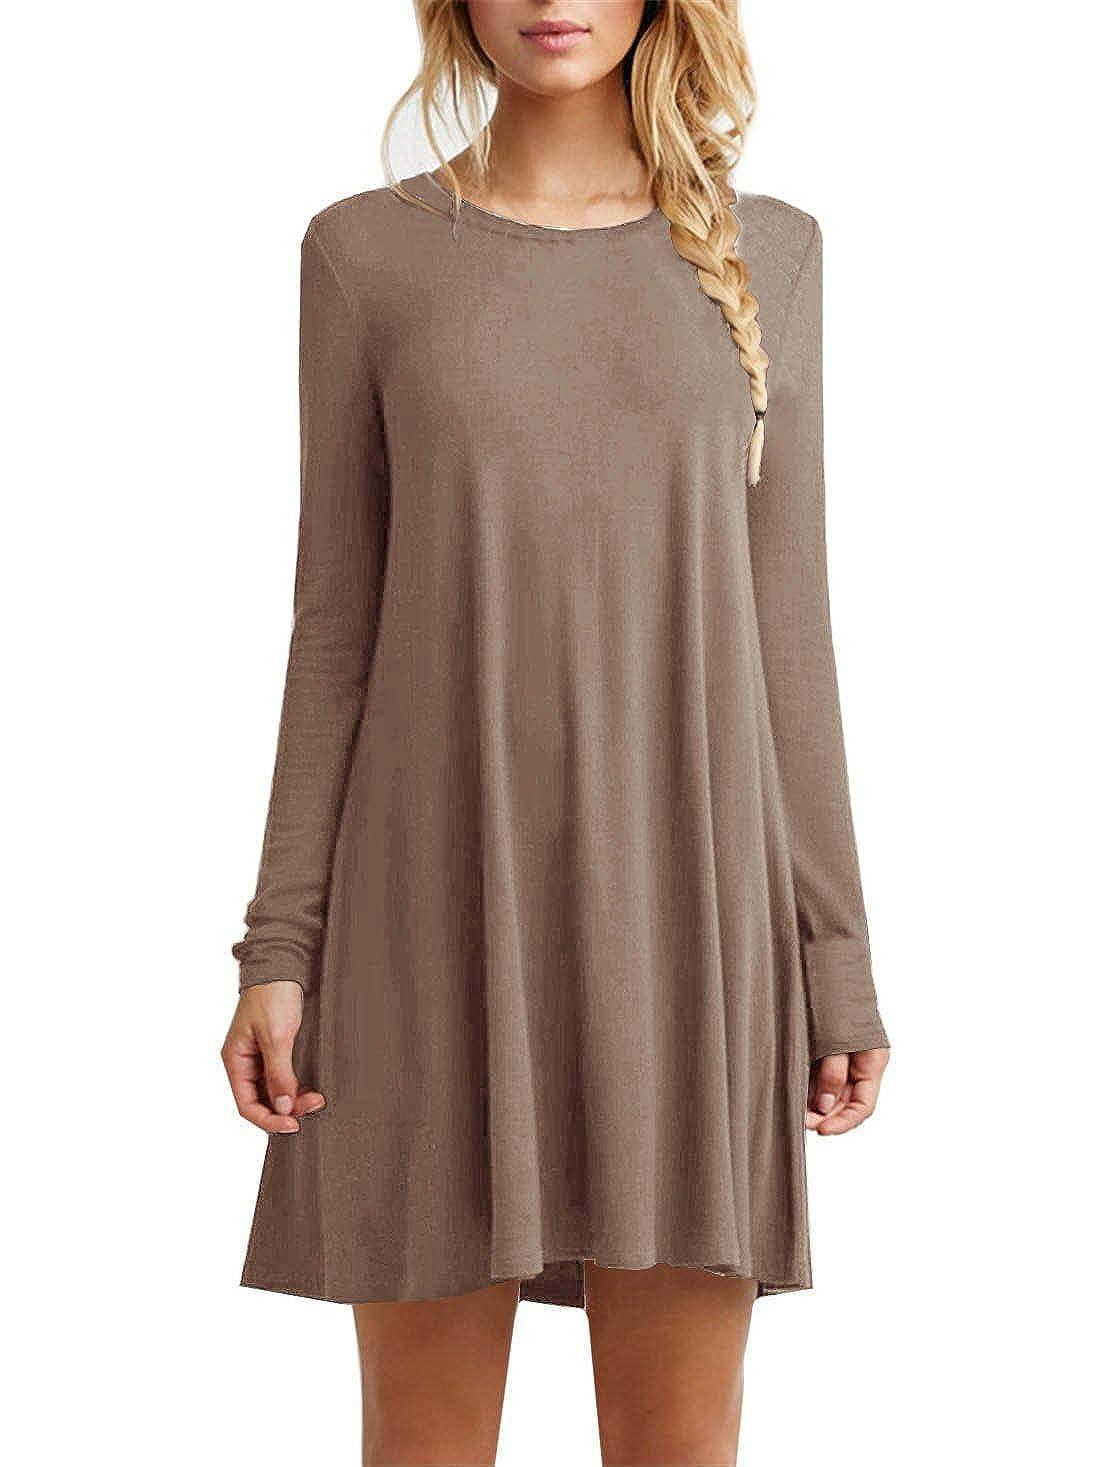 71coffeelongslee TOPONSKY Women's Casual Plain Simple TShirt Loose Dress